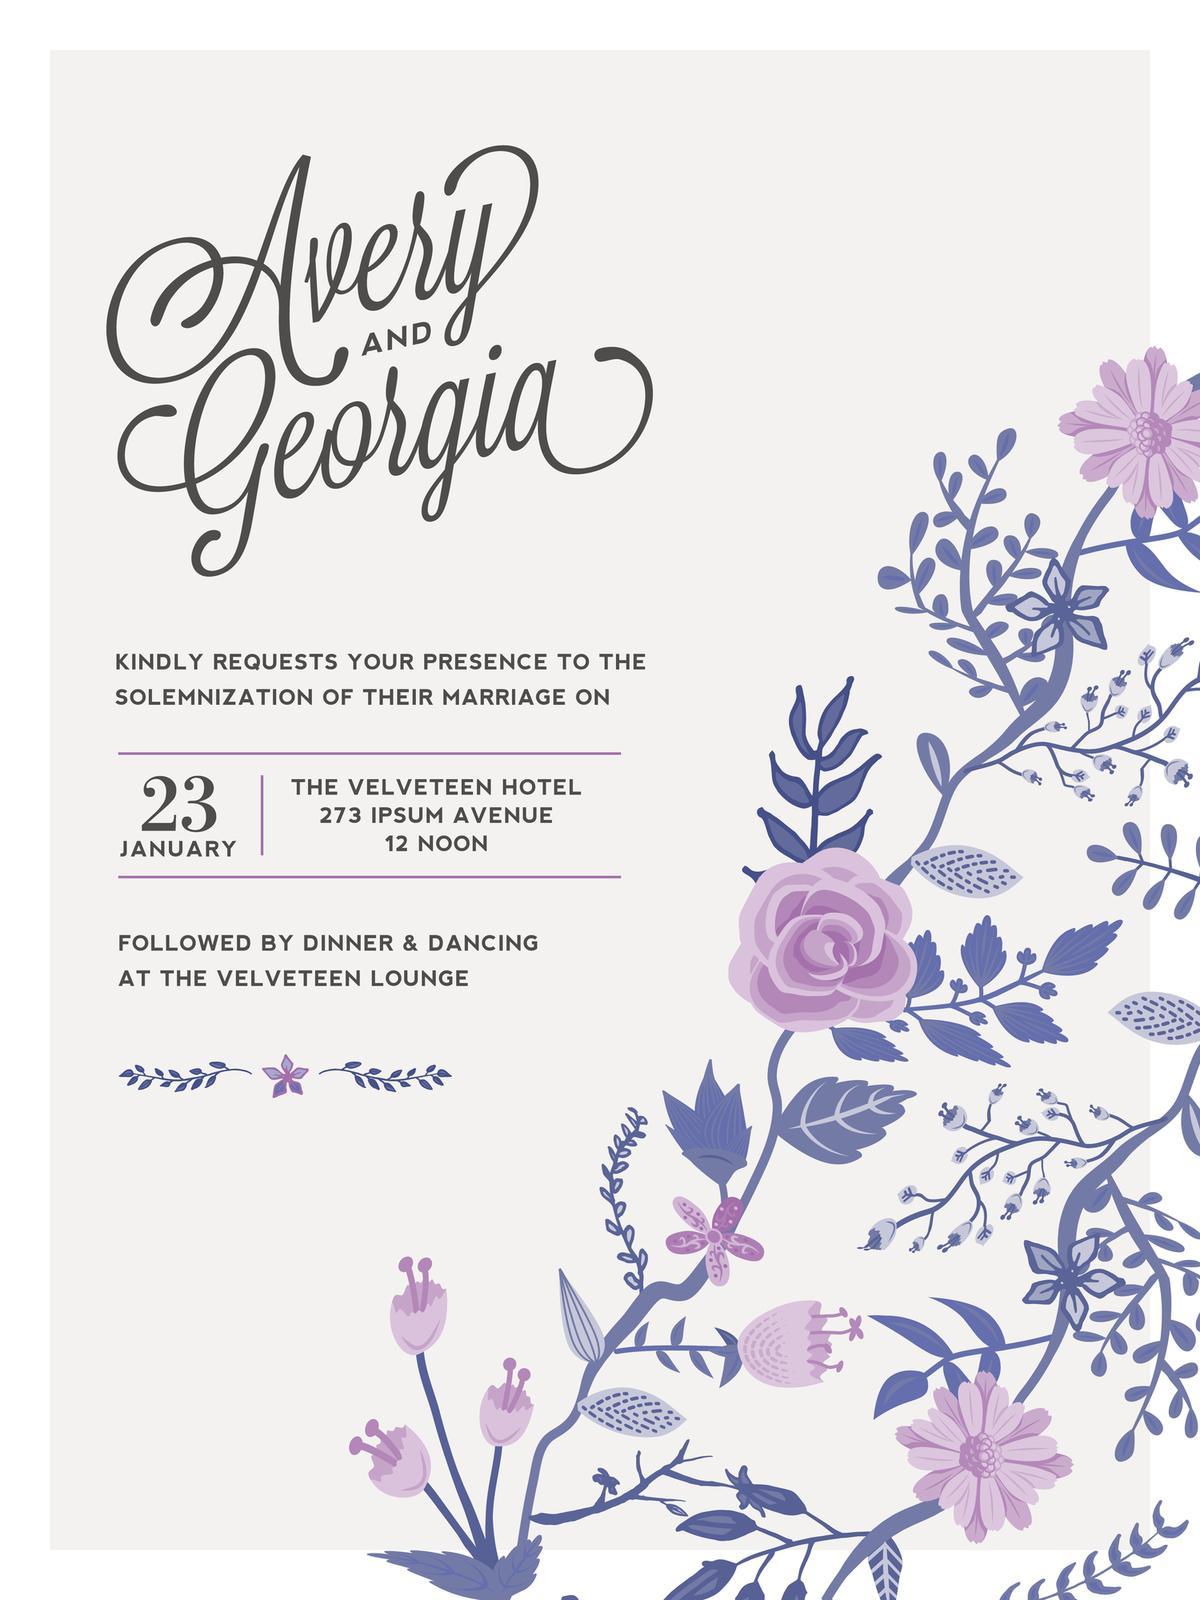 Do It Yourself Wedding Invitations Templates: 5 Exceptionally Thoughtful Do-it-yourself Wedding Invitations